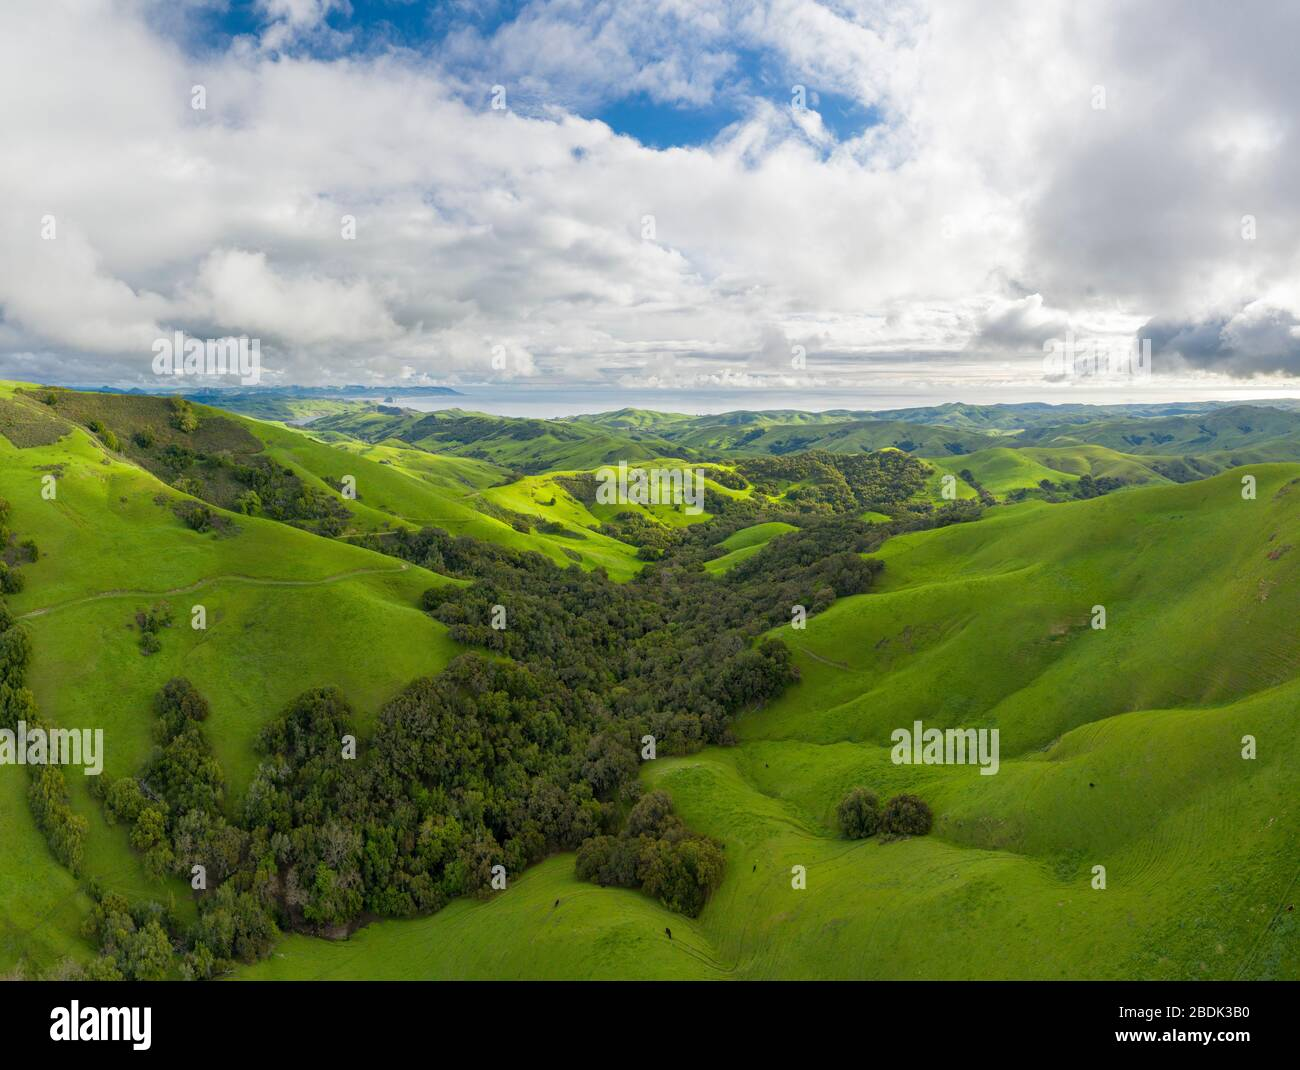 Green Rolling Hills Idyllic Scene in California After Heavy Spri Stock Photo